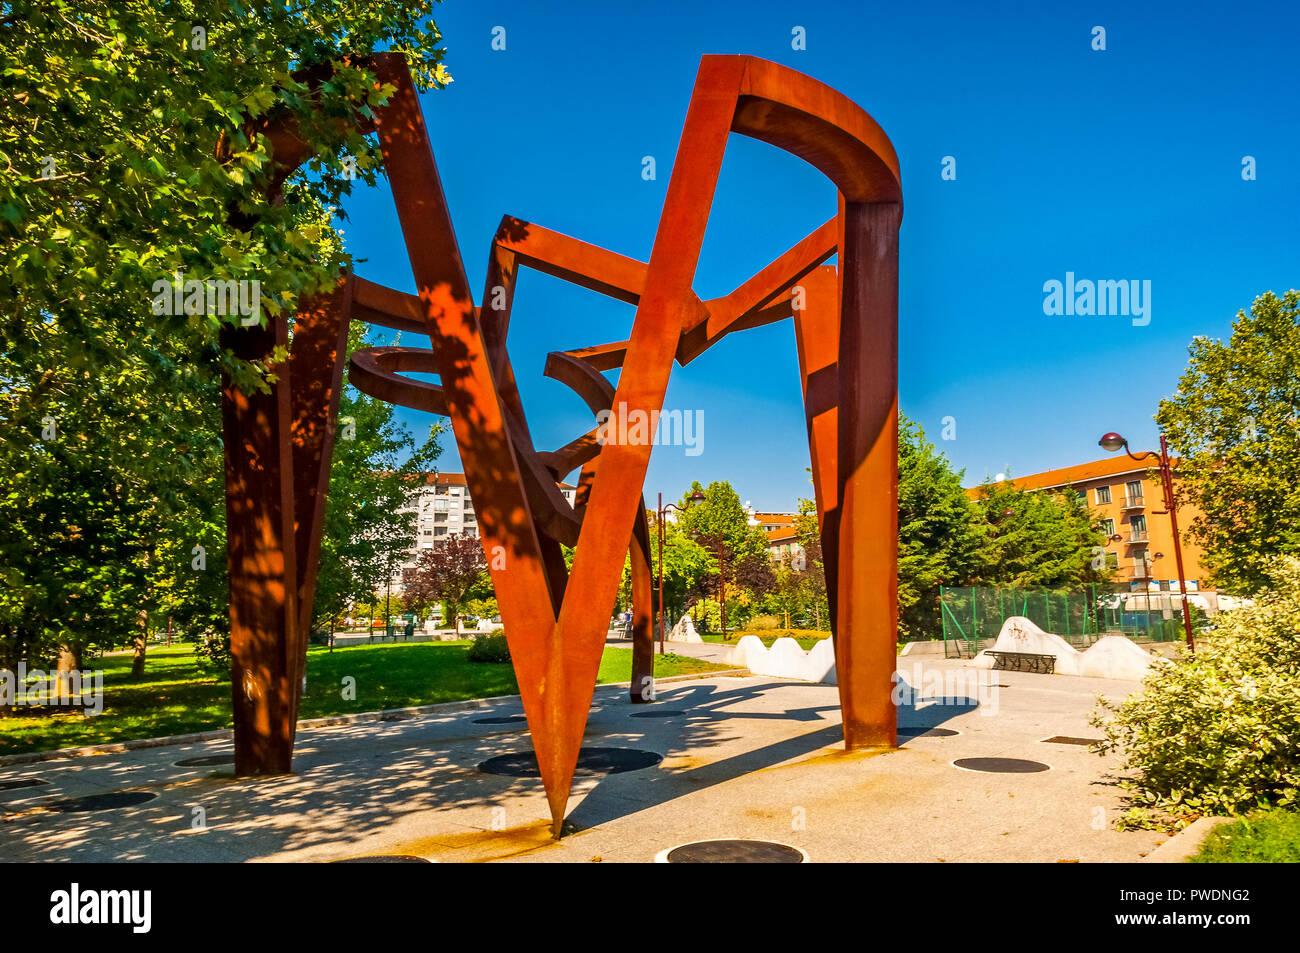 Italy Piedmont Turin Piazza Galimberti Modern Art Works in Outside Artist Riccardi Cordero'Chakra'2005 - Stock Image